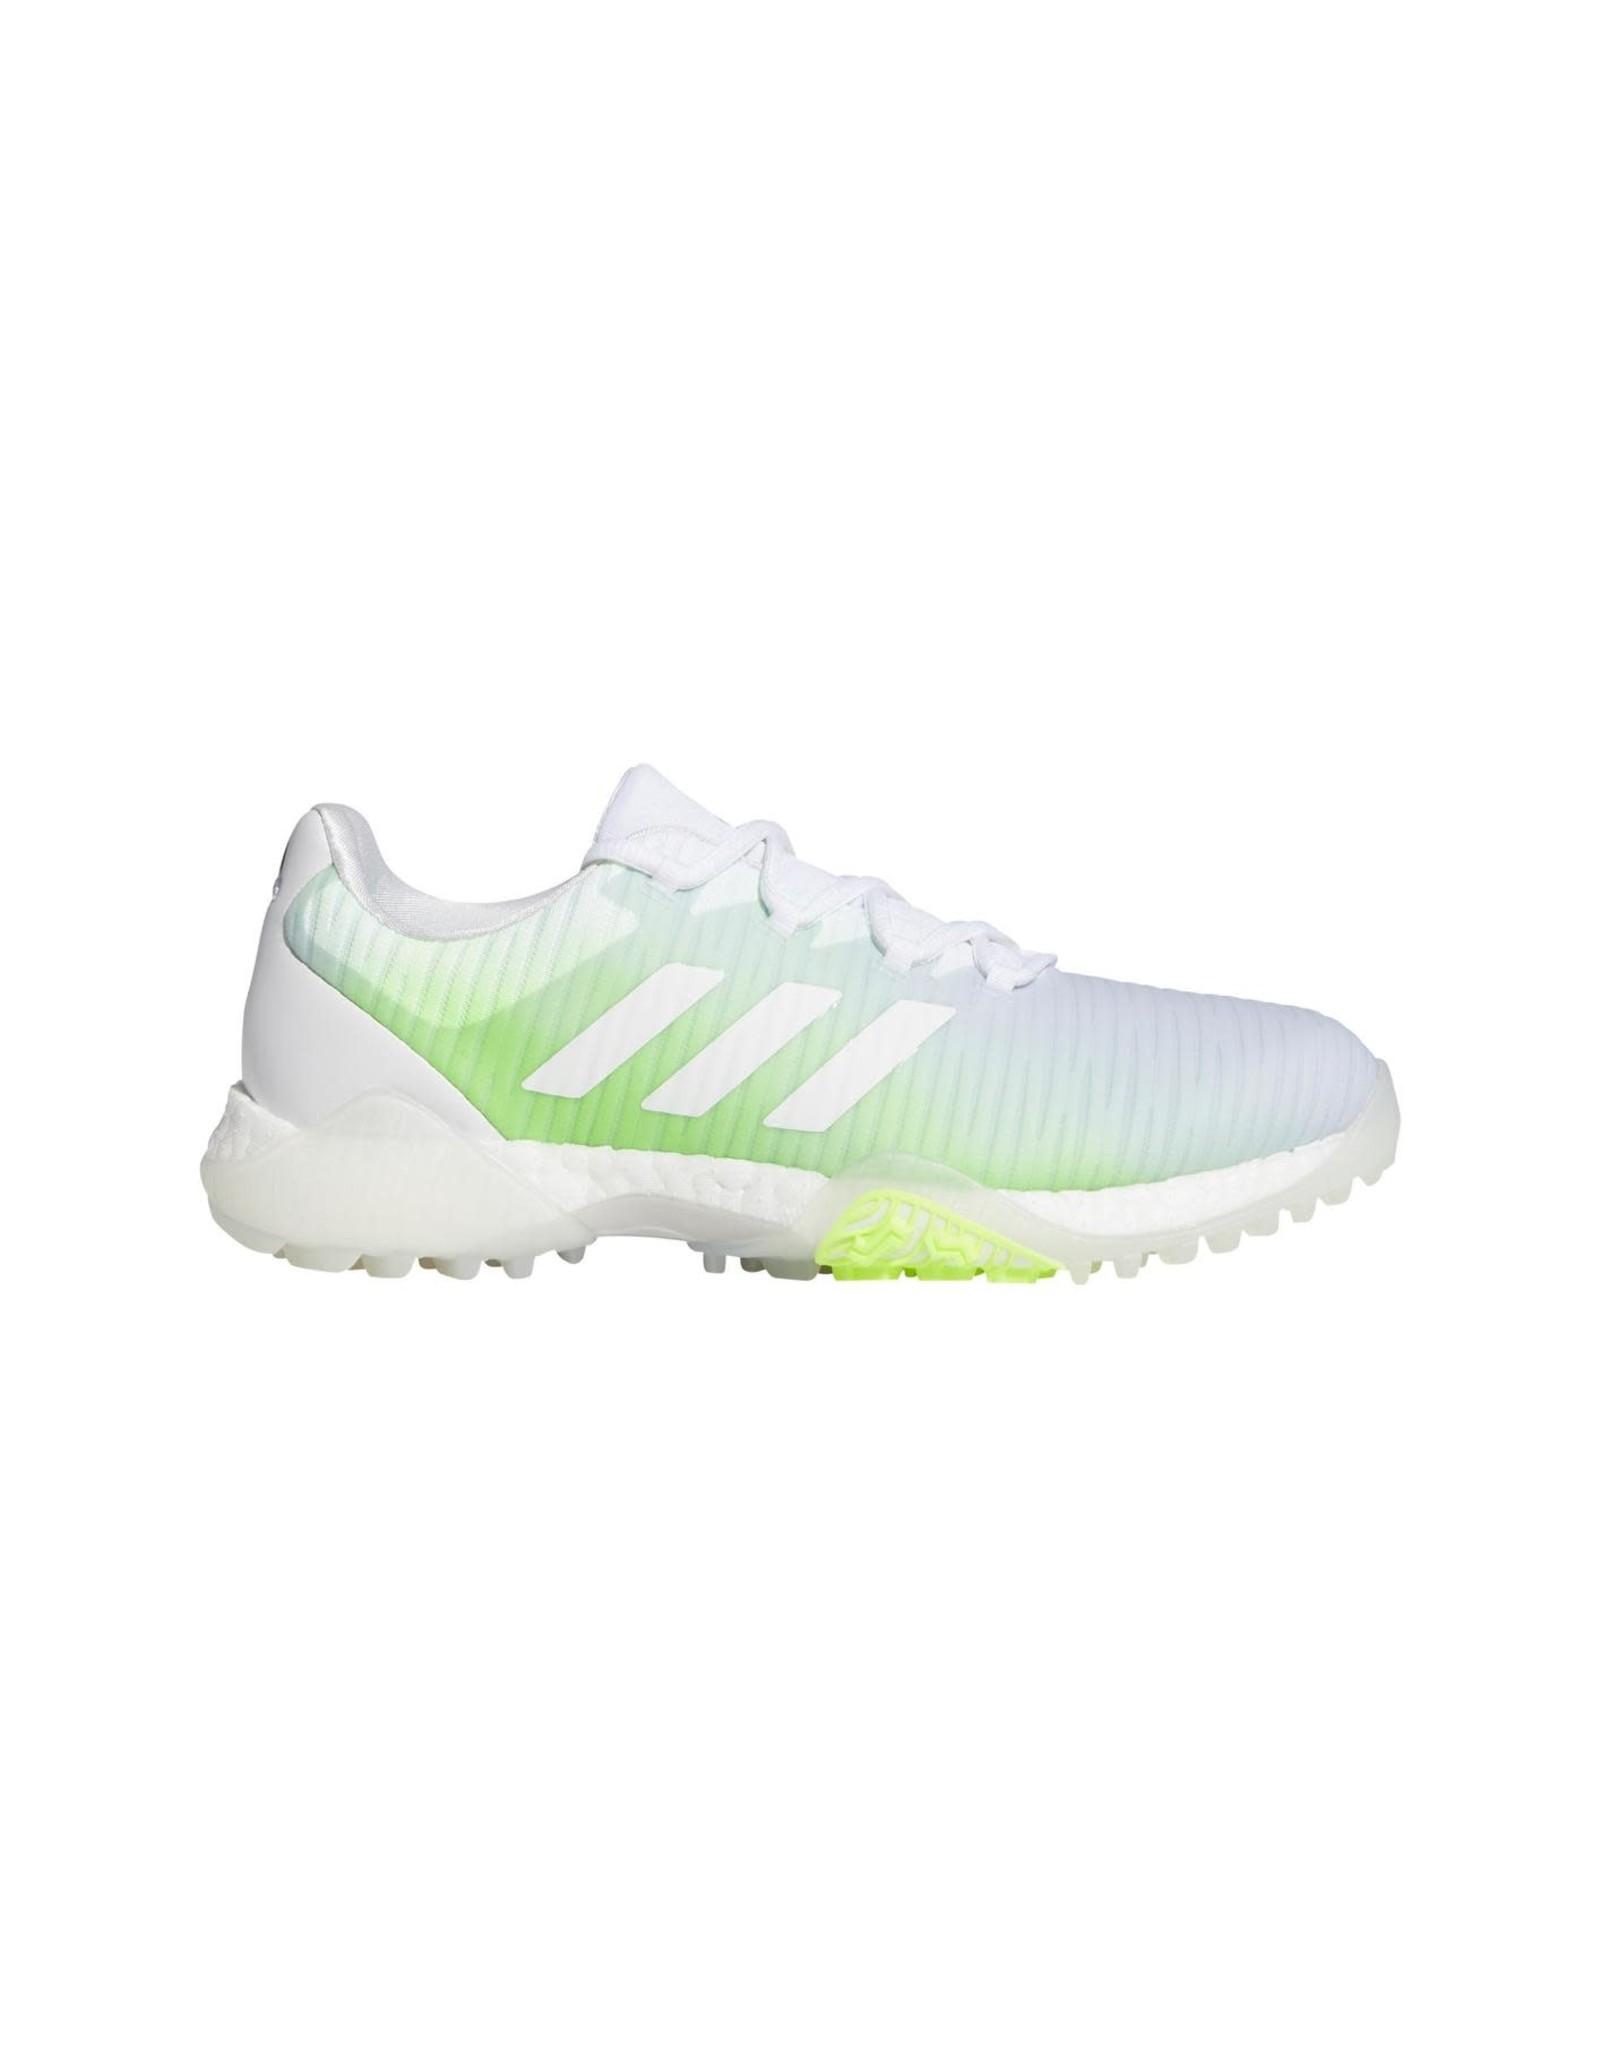 Adidas Shoe Ladies Adi Code Chaos